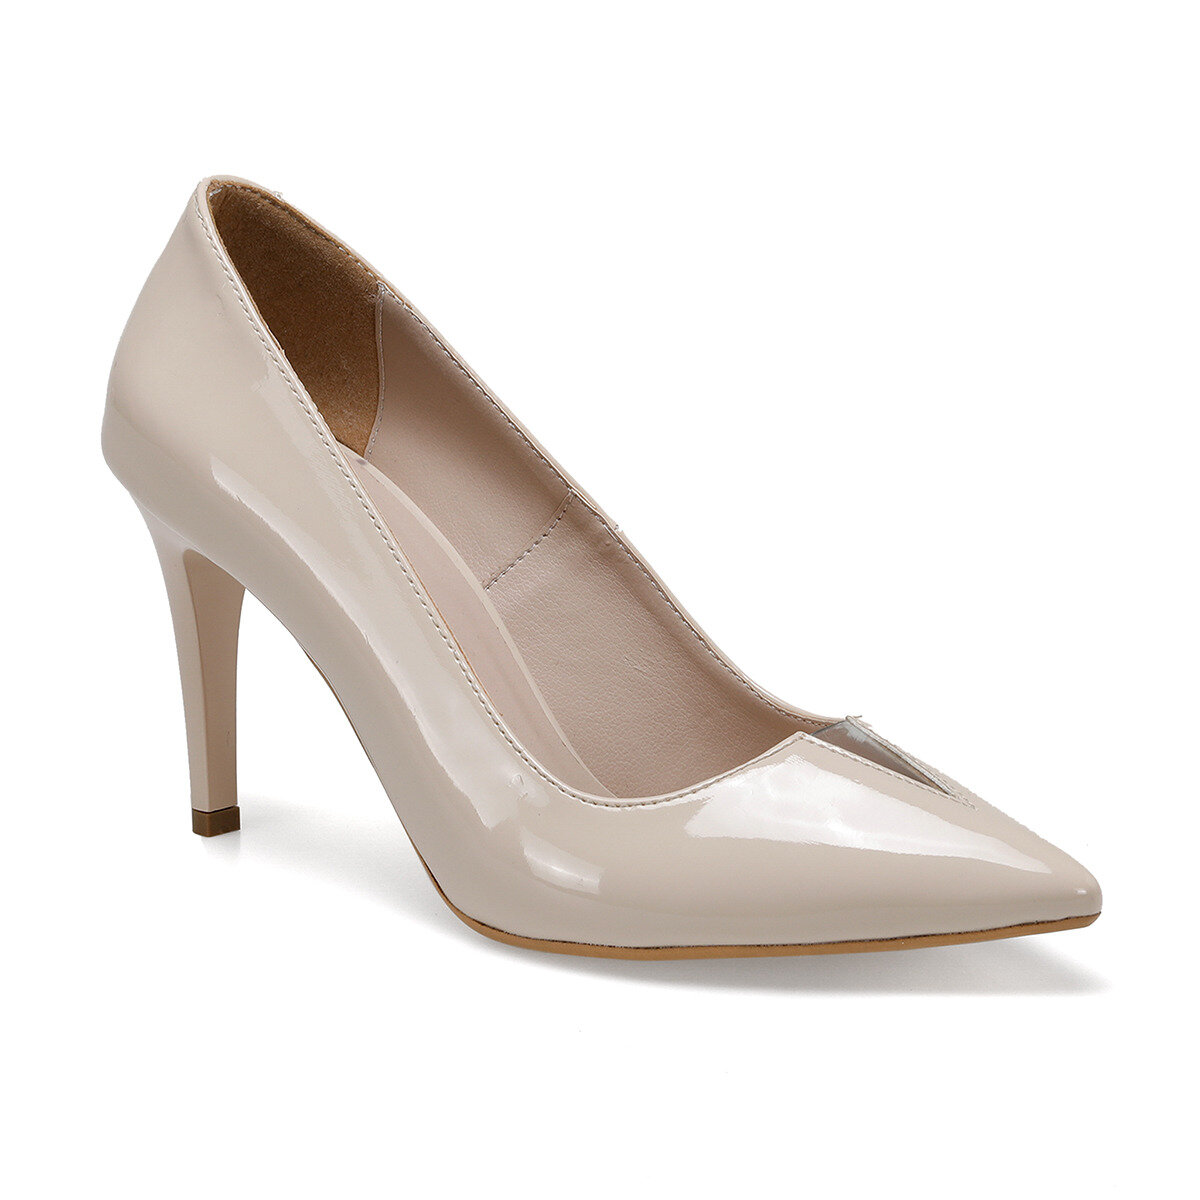 FLO DS20043 chaussures femme Beige Gova Miss F